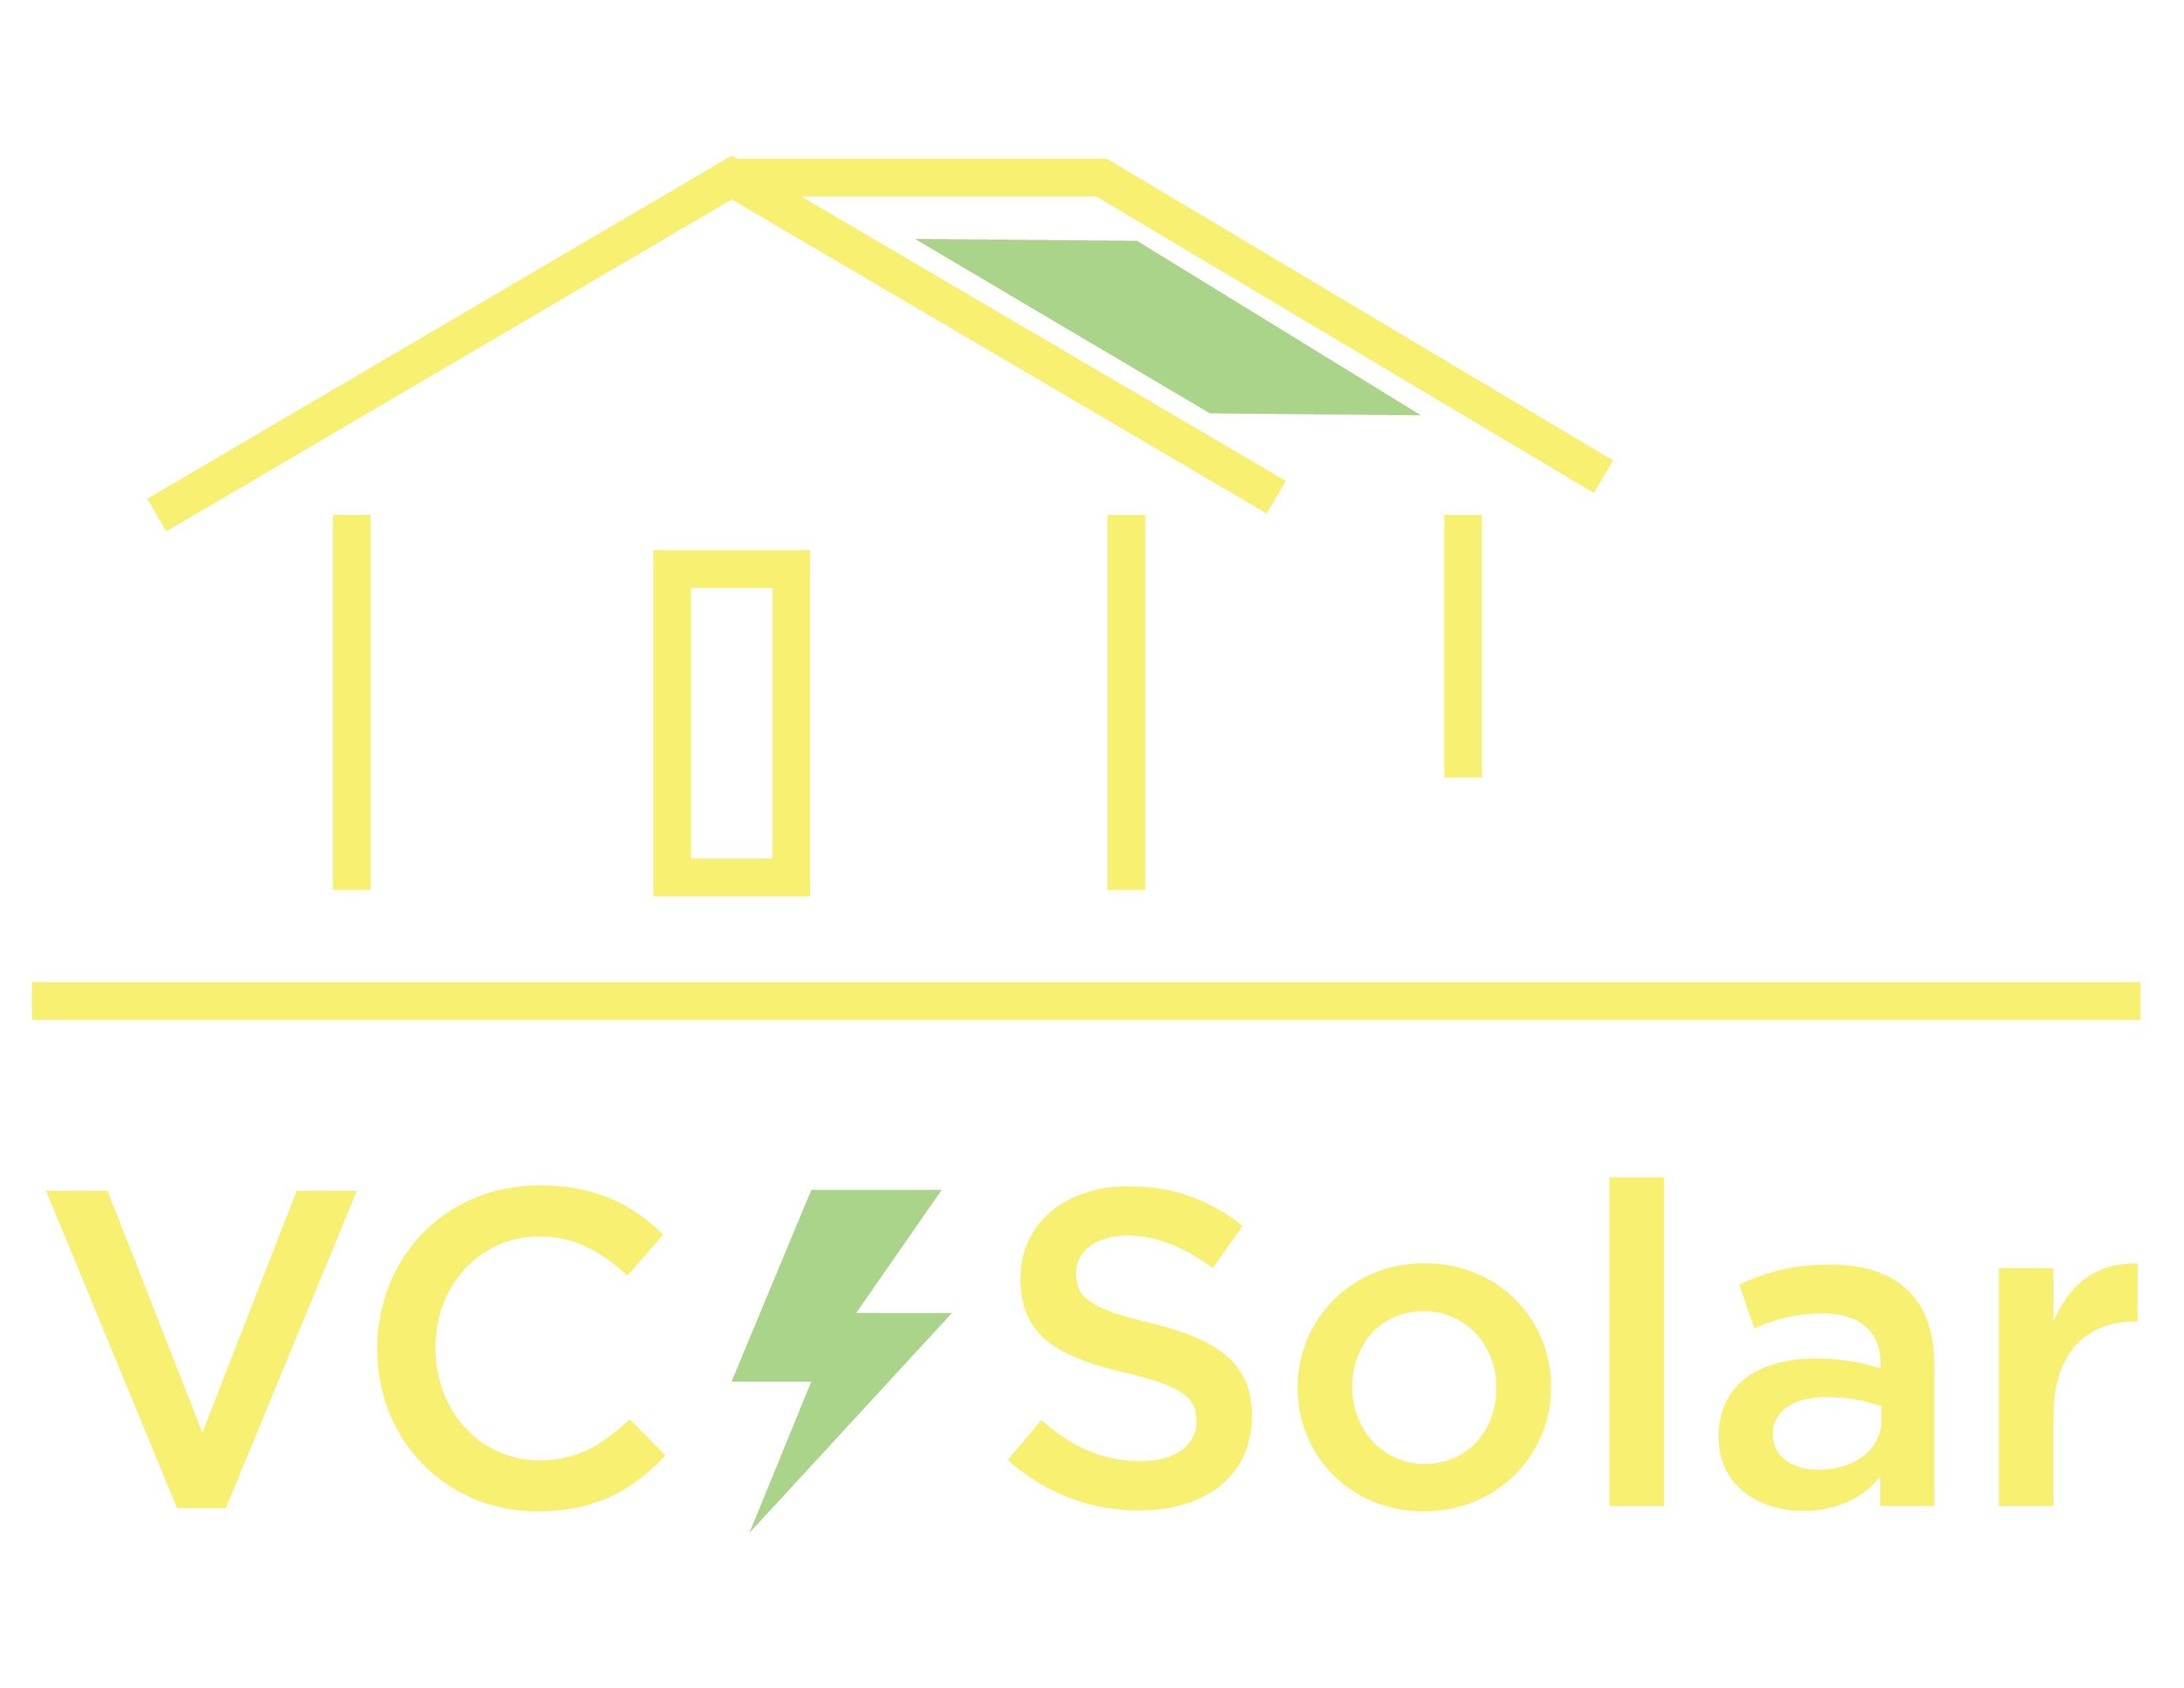 Vivint solar reviews california - Vc Solar